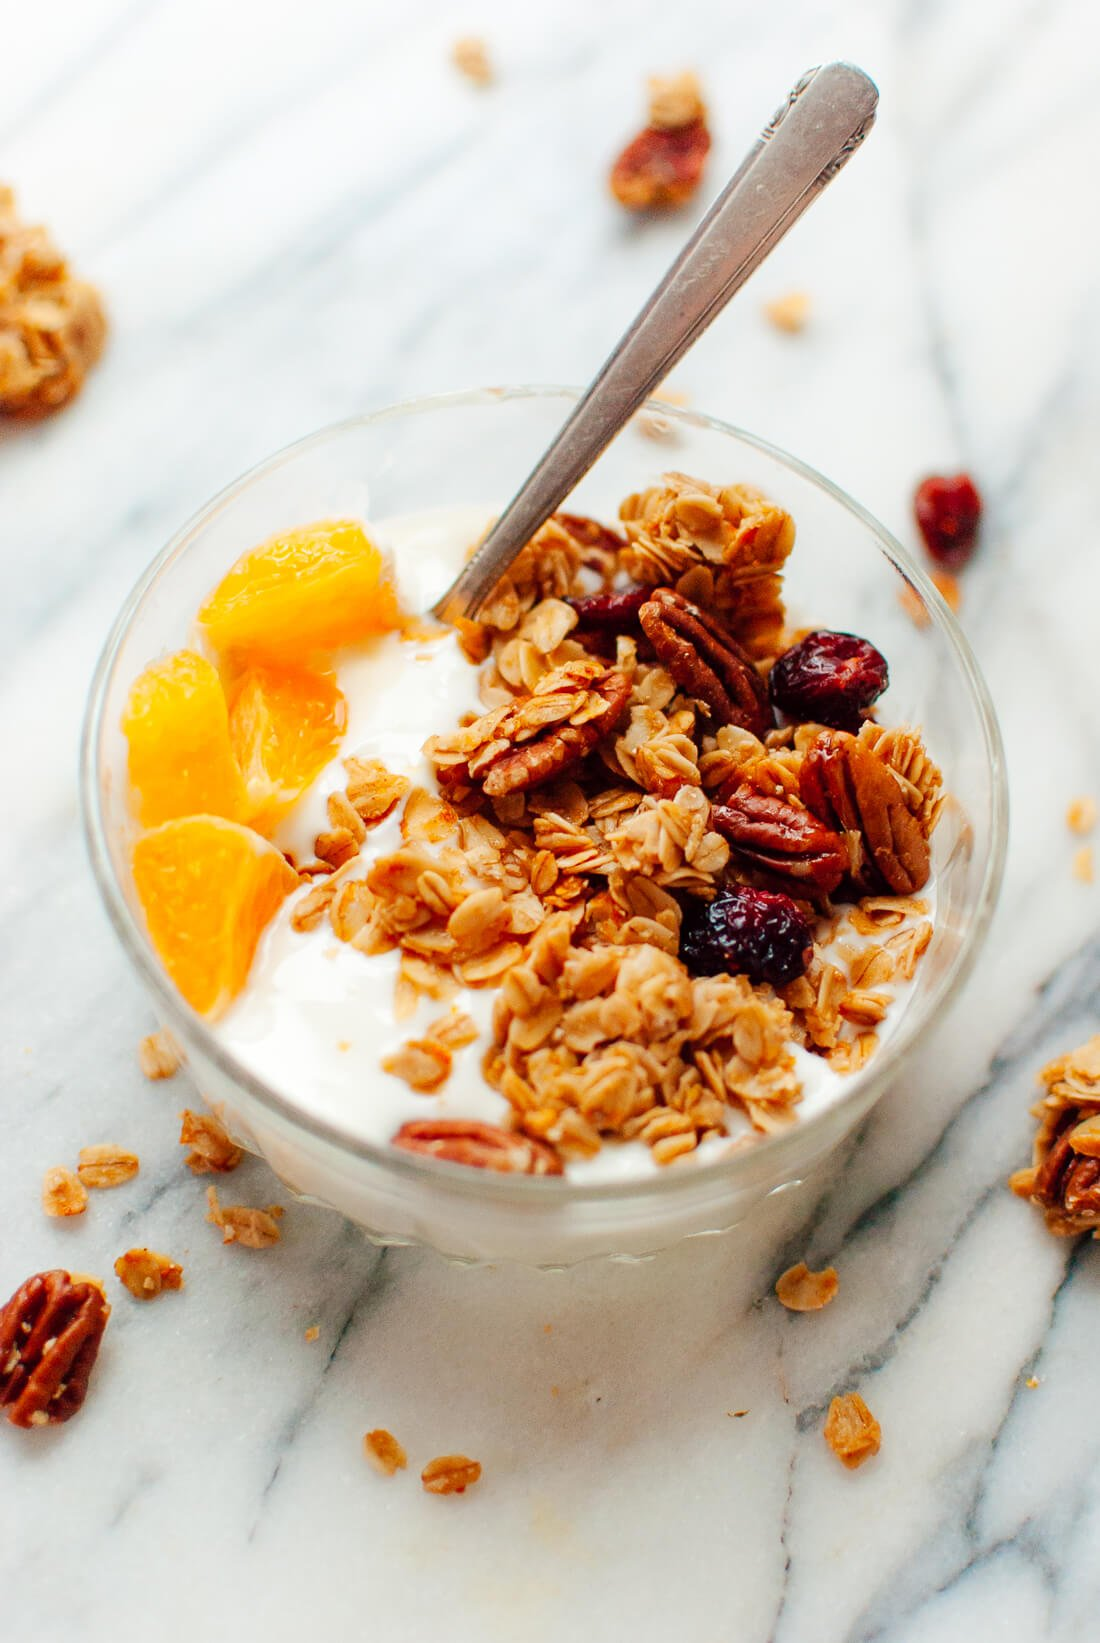 cranberry orange granola with yogurt